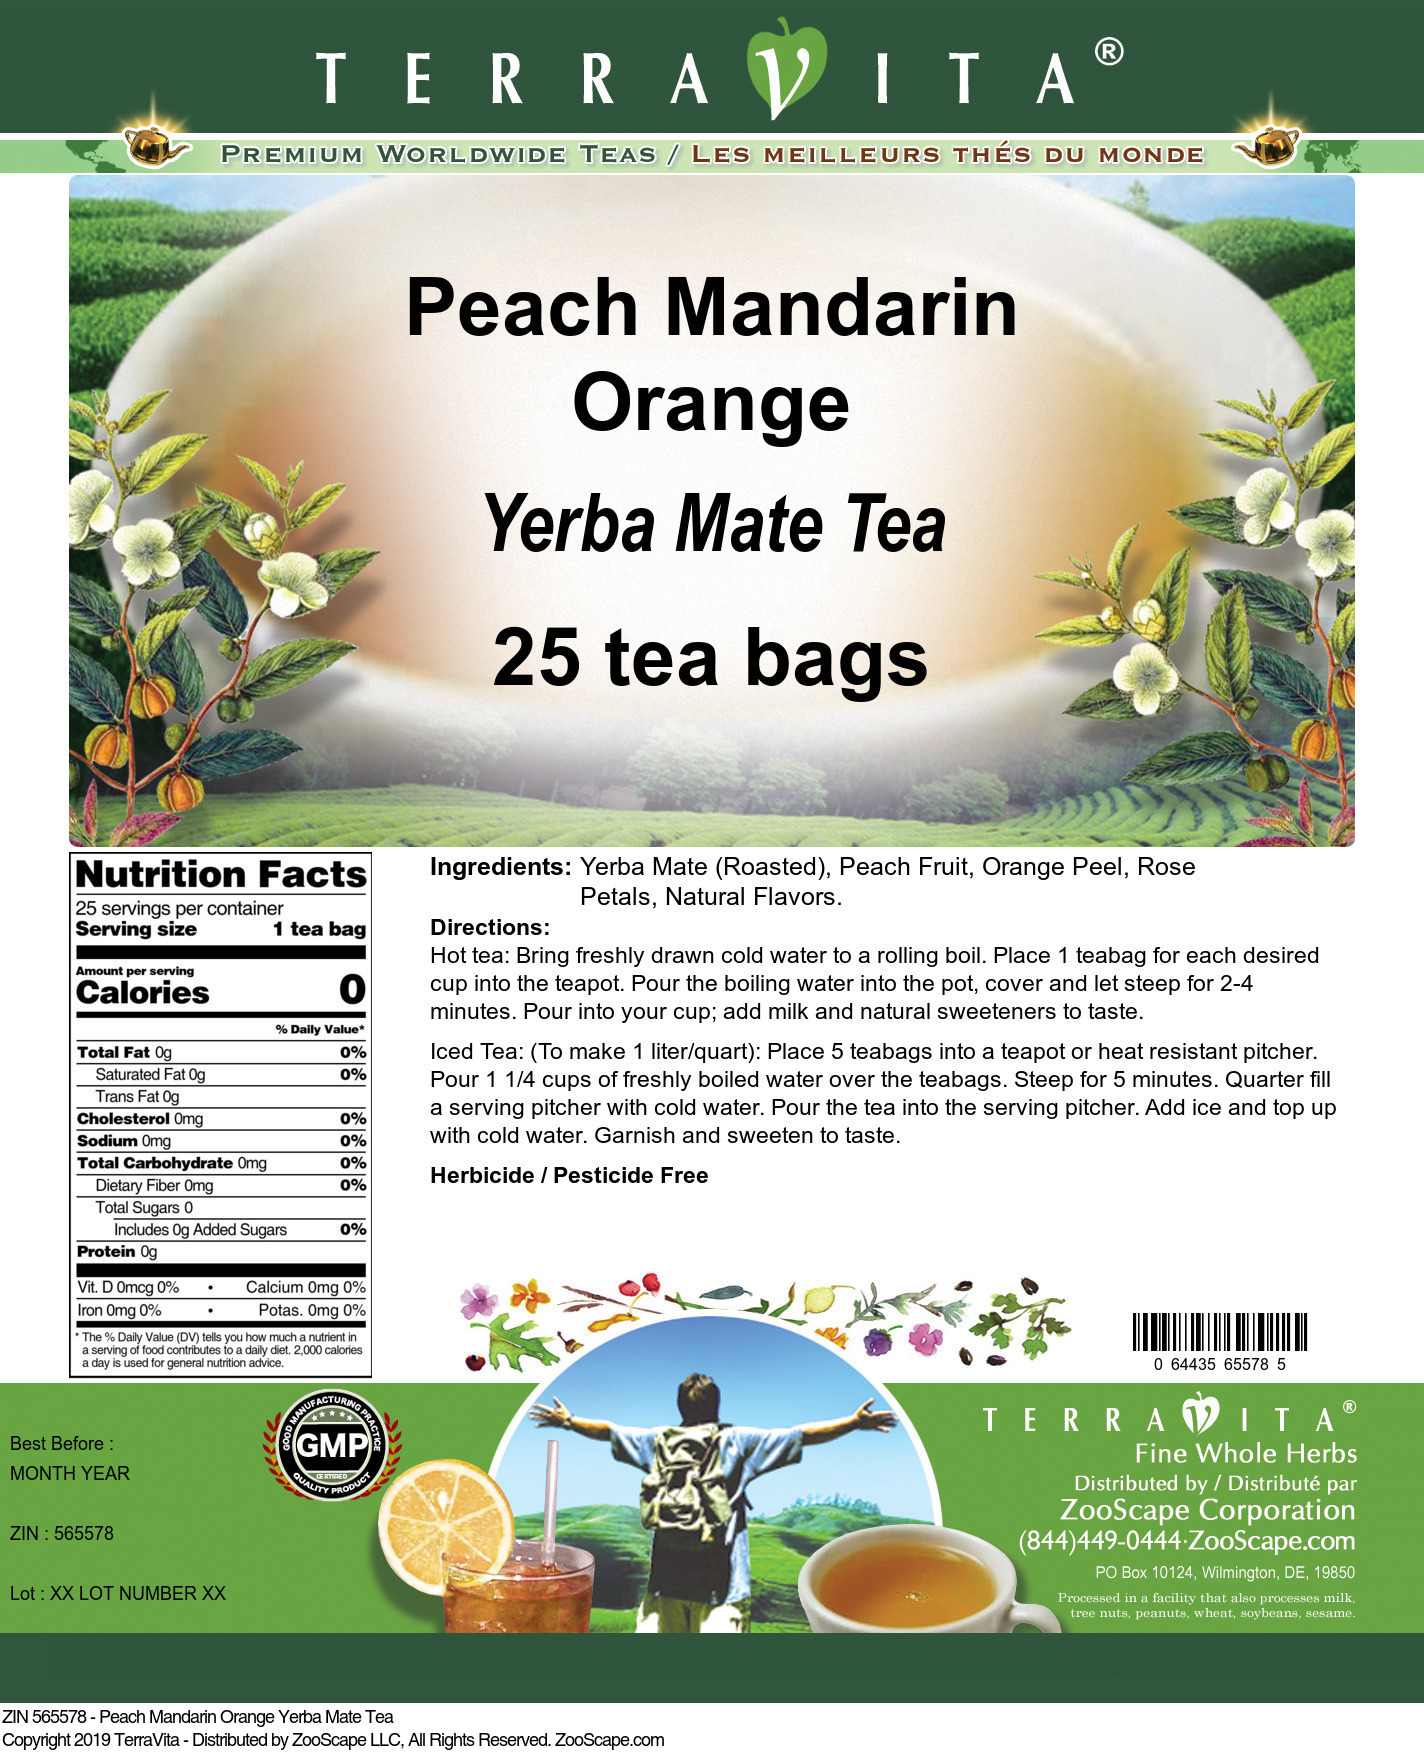 Peach Mandarin Orange Yerba Mate Tea